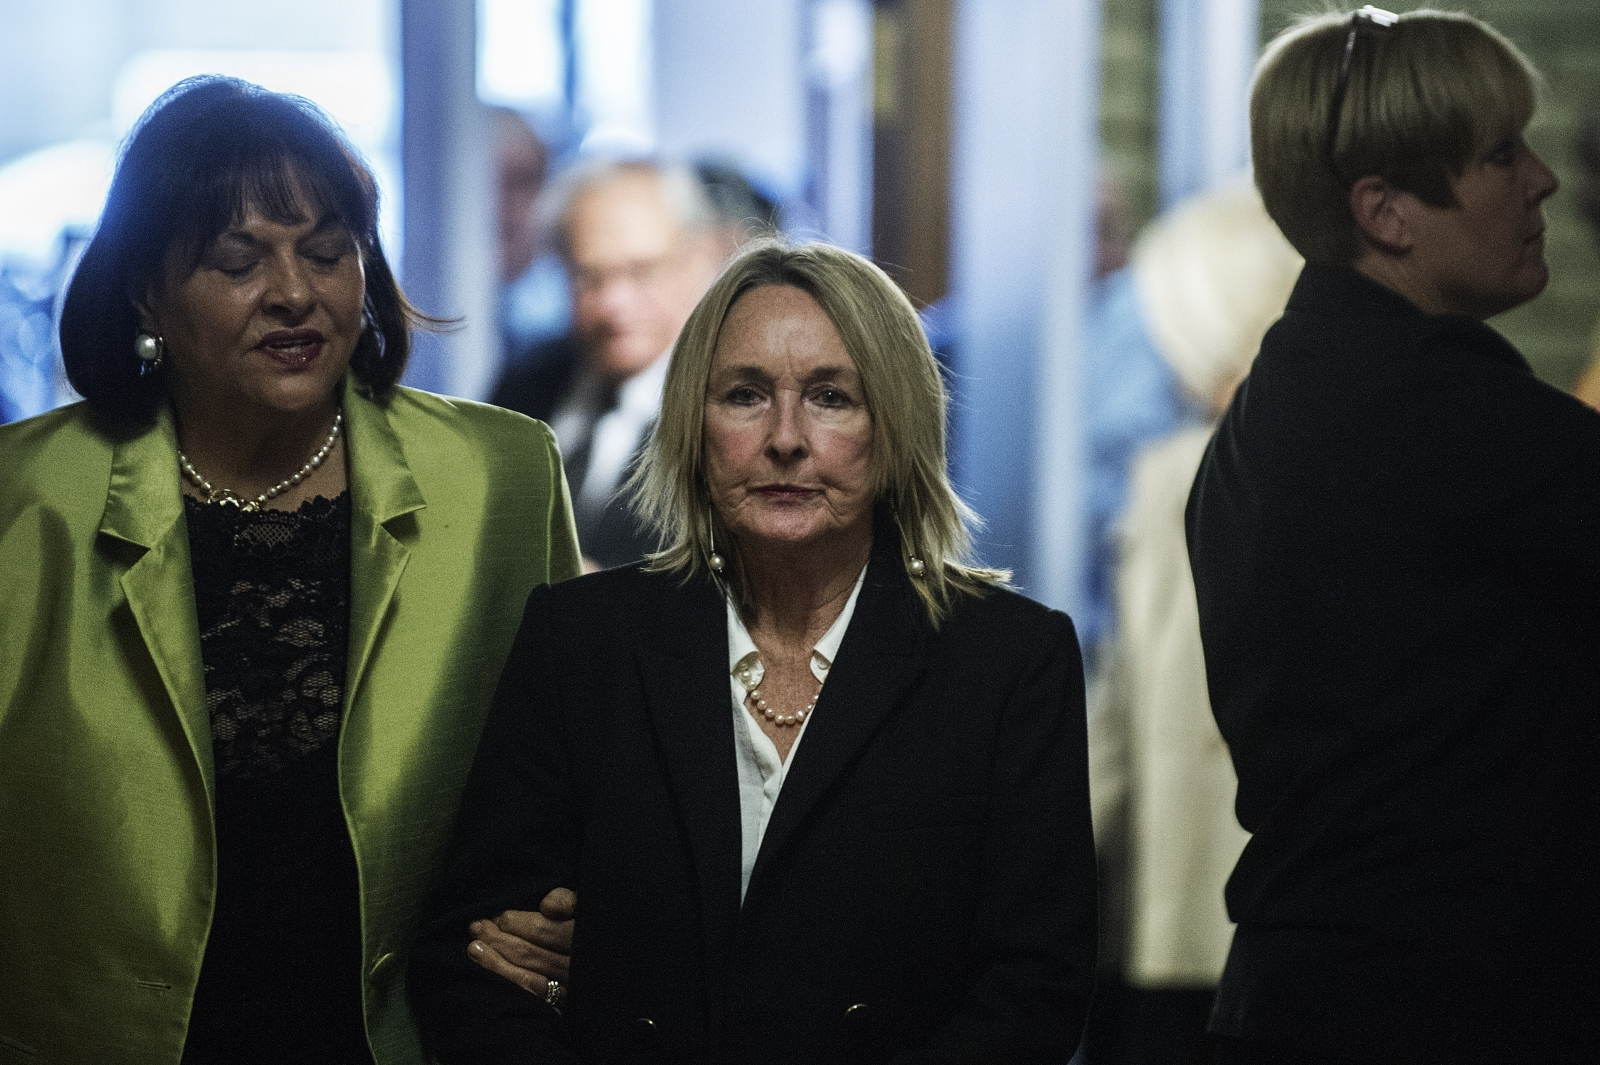 June Steenkamp, the mother of Oscar Pistorius' victim Reeva, arrives at court